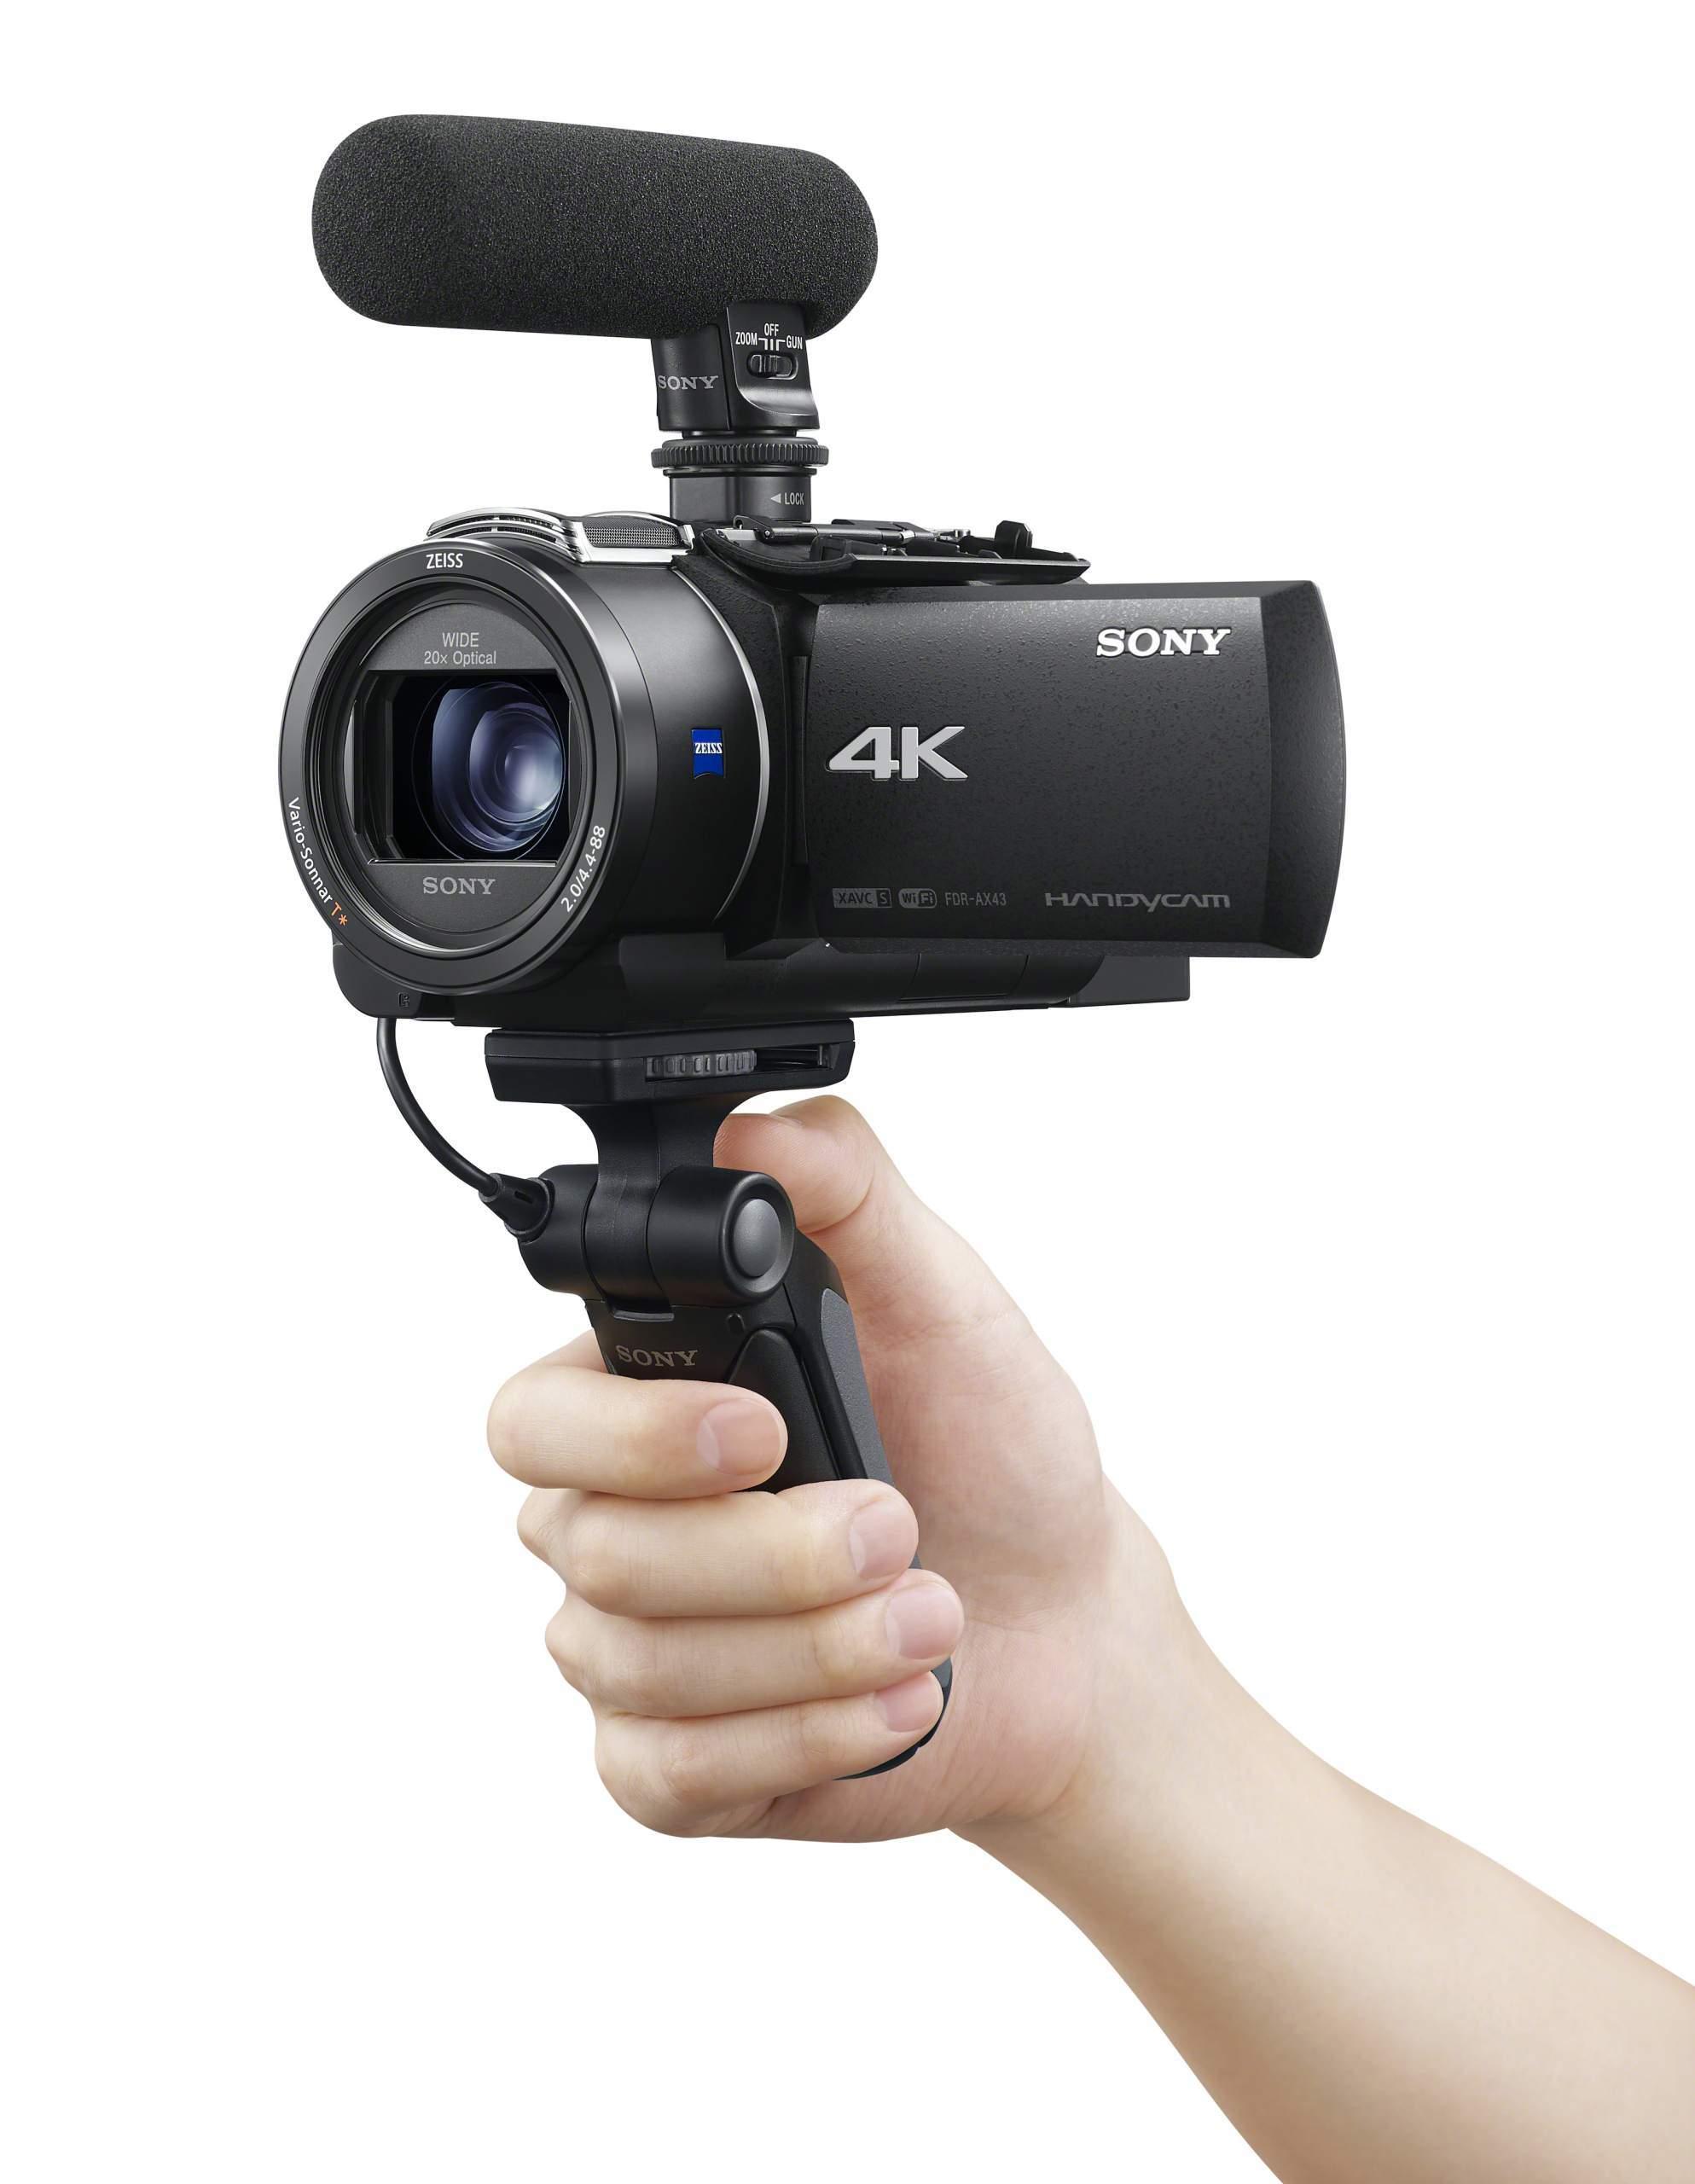 Handycam with Balanced Optical SteadyShot